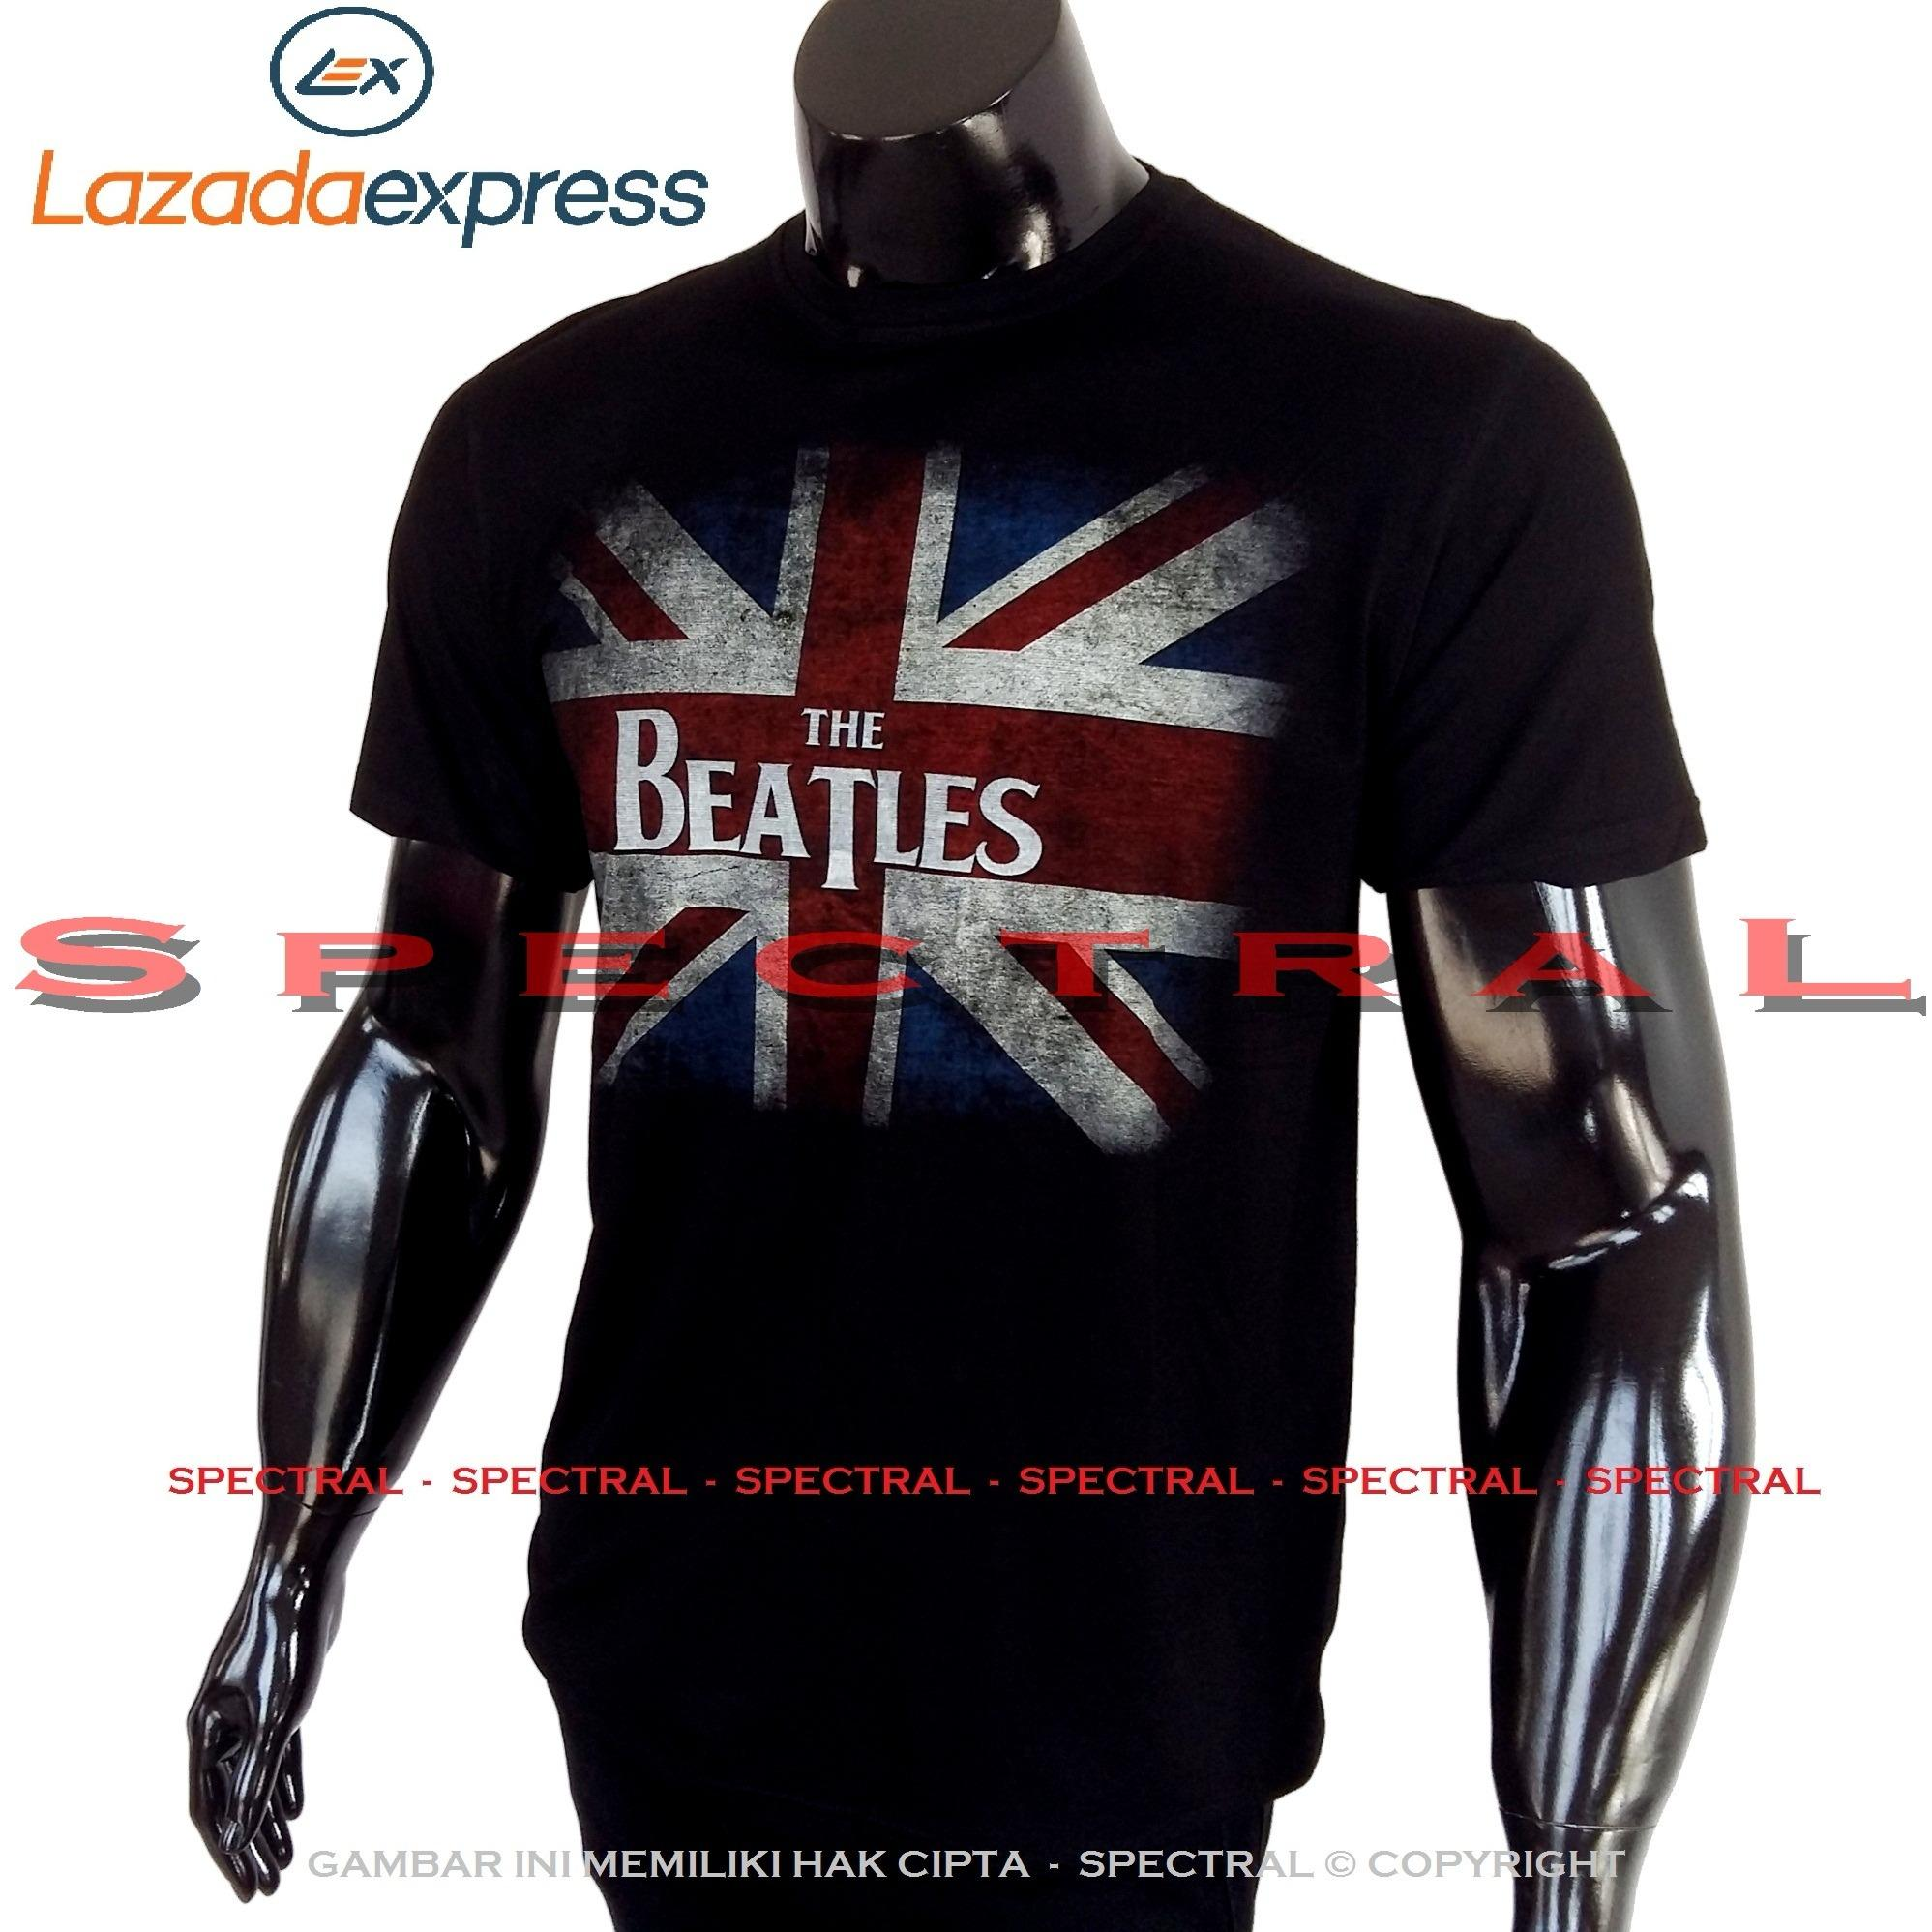 Spectral – THE BEATLES 100% Soft Cotton Combed 30s Kaos Distro Fashion T-Shirt Atasan Oblong Baju Pakaian Polos Shirt Pria Wanita Cewe Cowo  Lengan Murah Bagus Keren Jaman Kekinian Jakarta Bandung Tumblr Hitam Gambar Musik Pop Rock Metal Artis Band Gitar